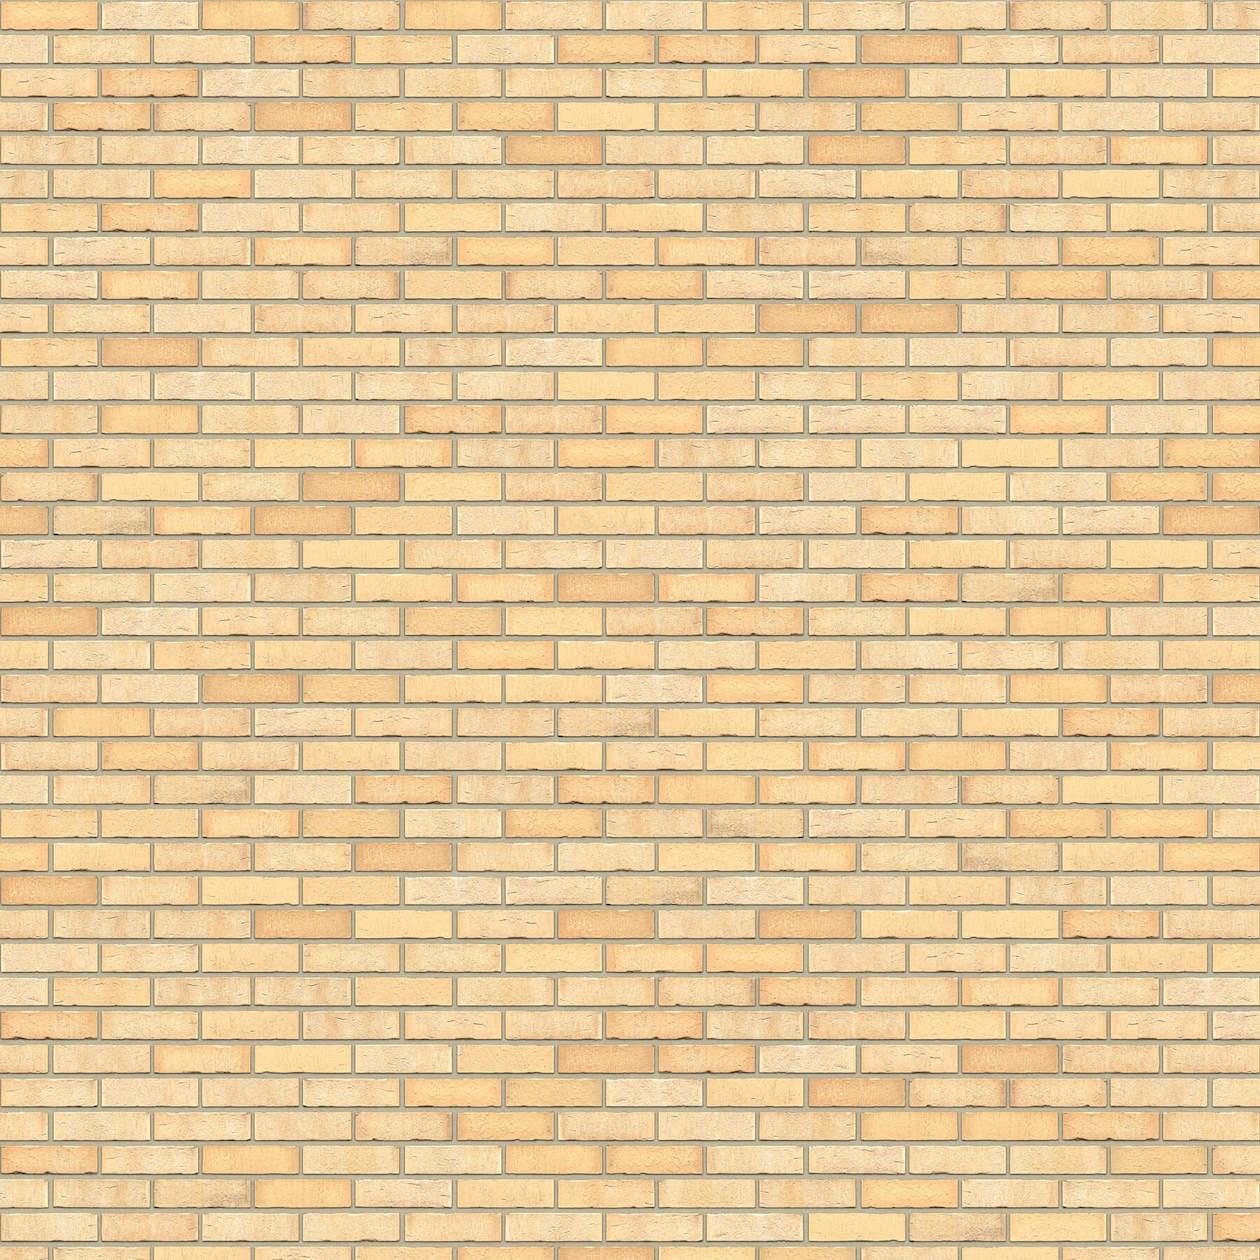 Puna-cigla-FeldHaus-Klinker-brick-house-Beograd-nf-k-724-Bez Fuga